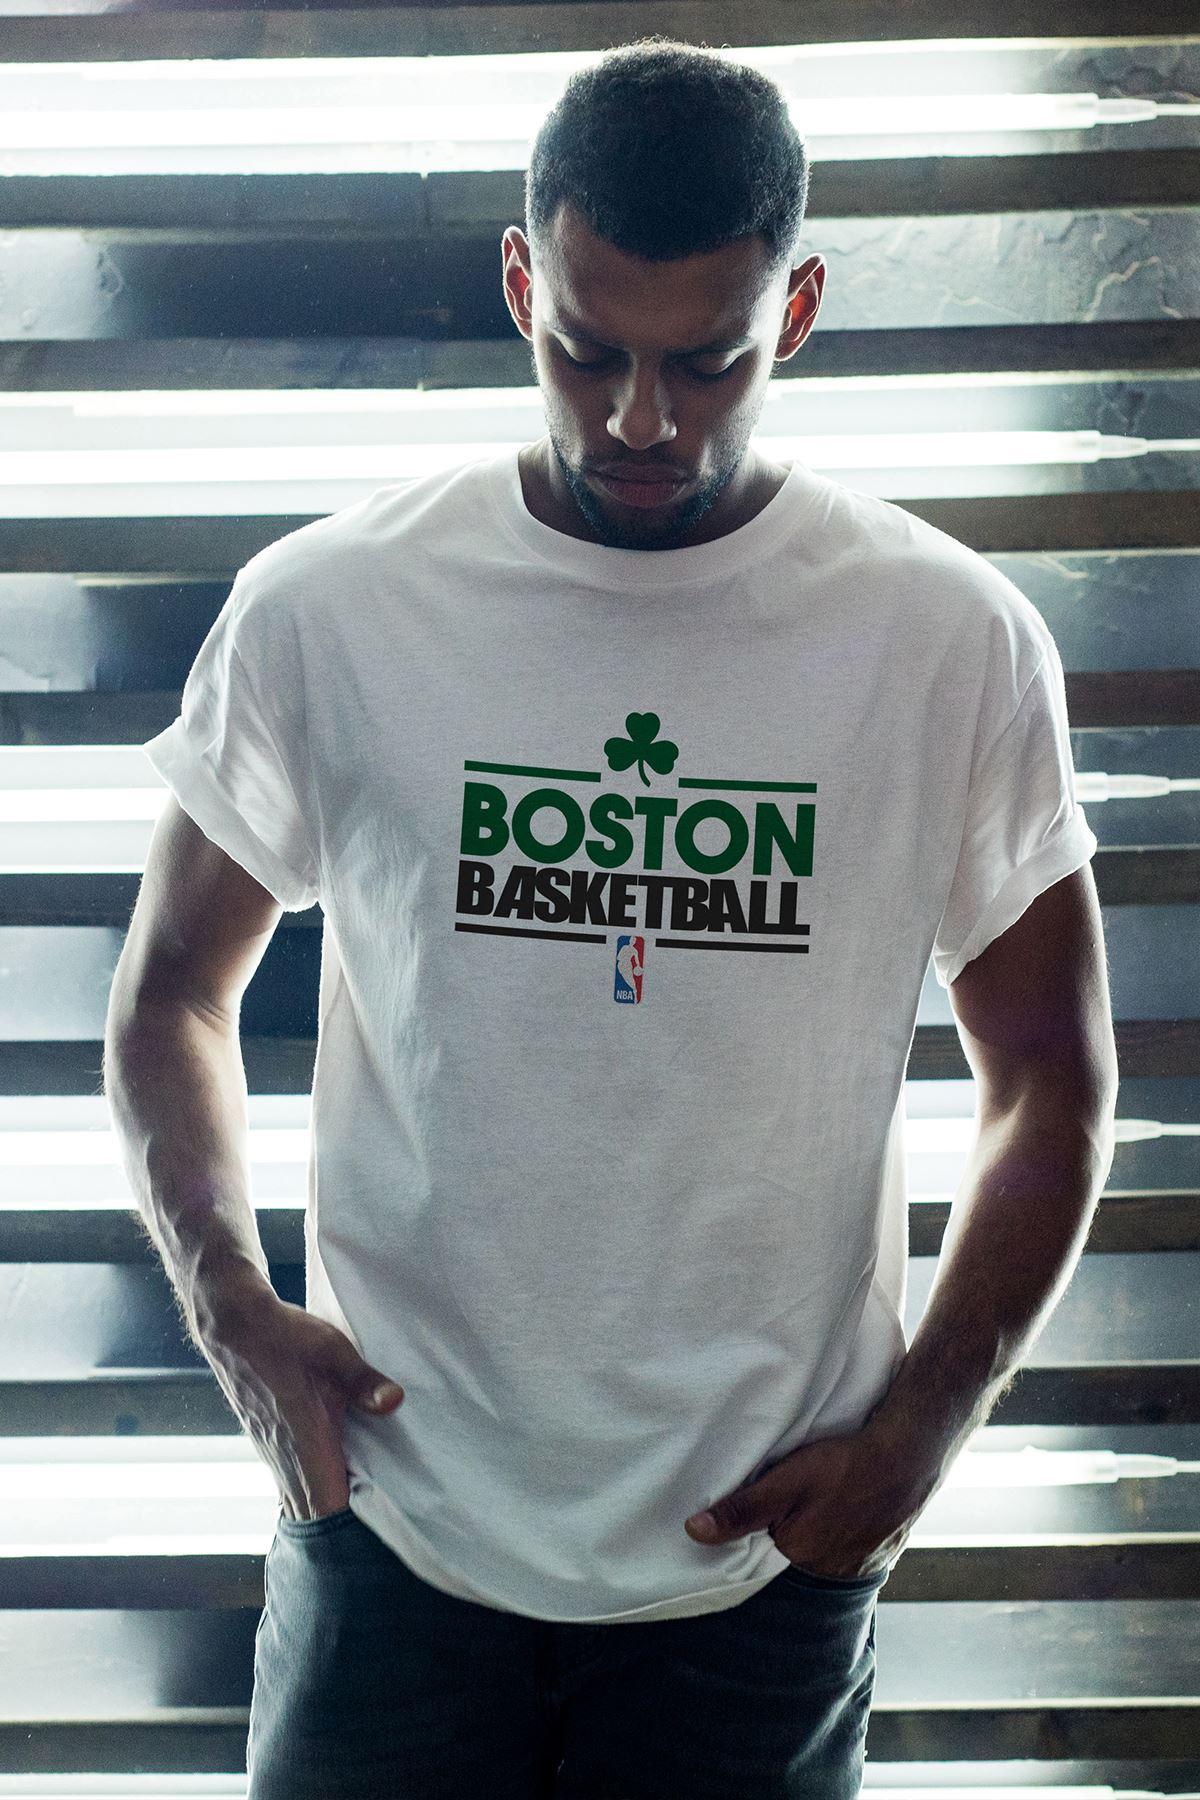 Boston Celtics 34 Beyaz Erkek Oversize Tshirt - Tişört